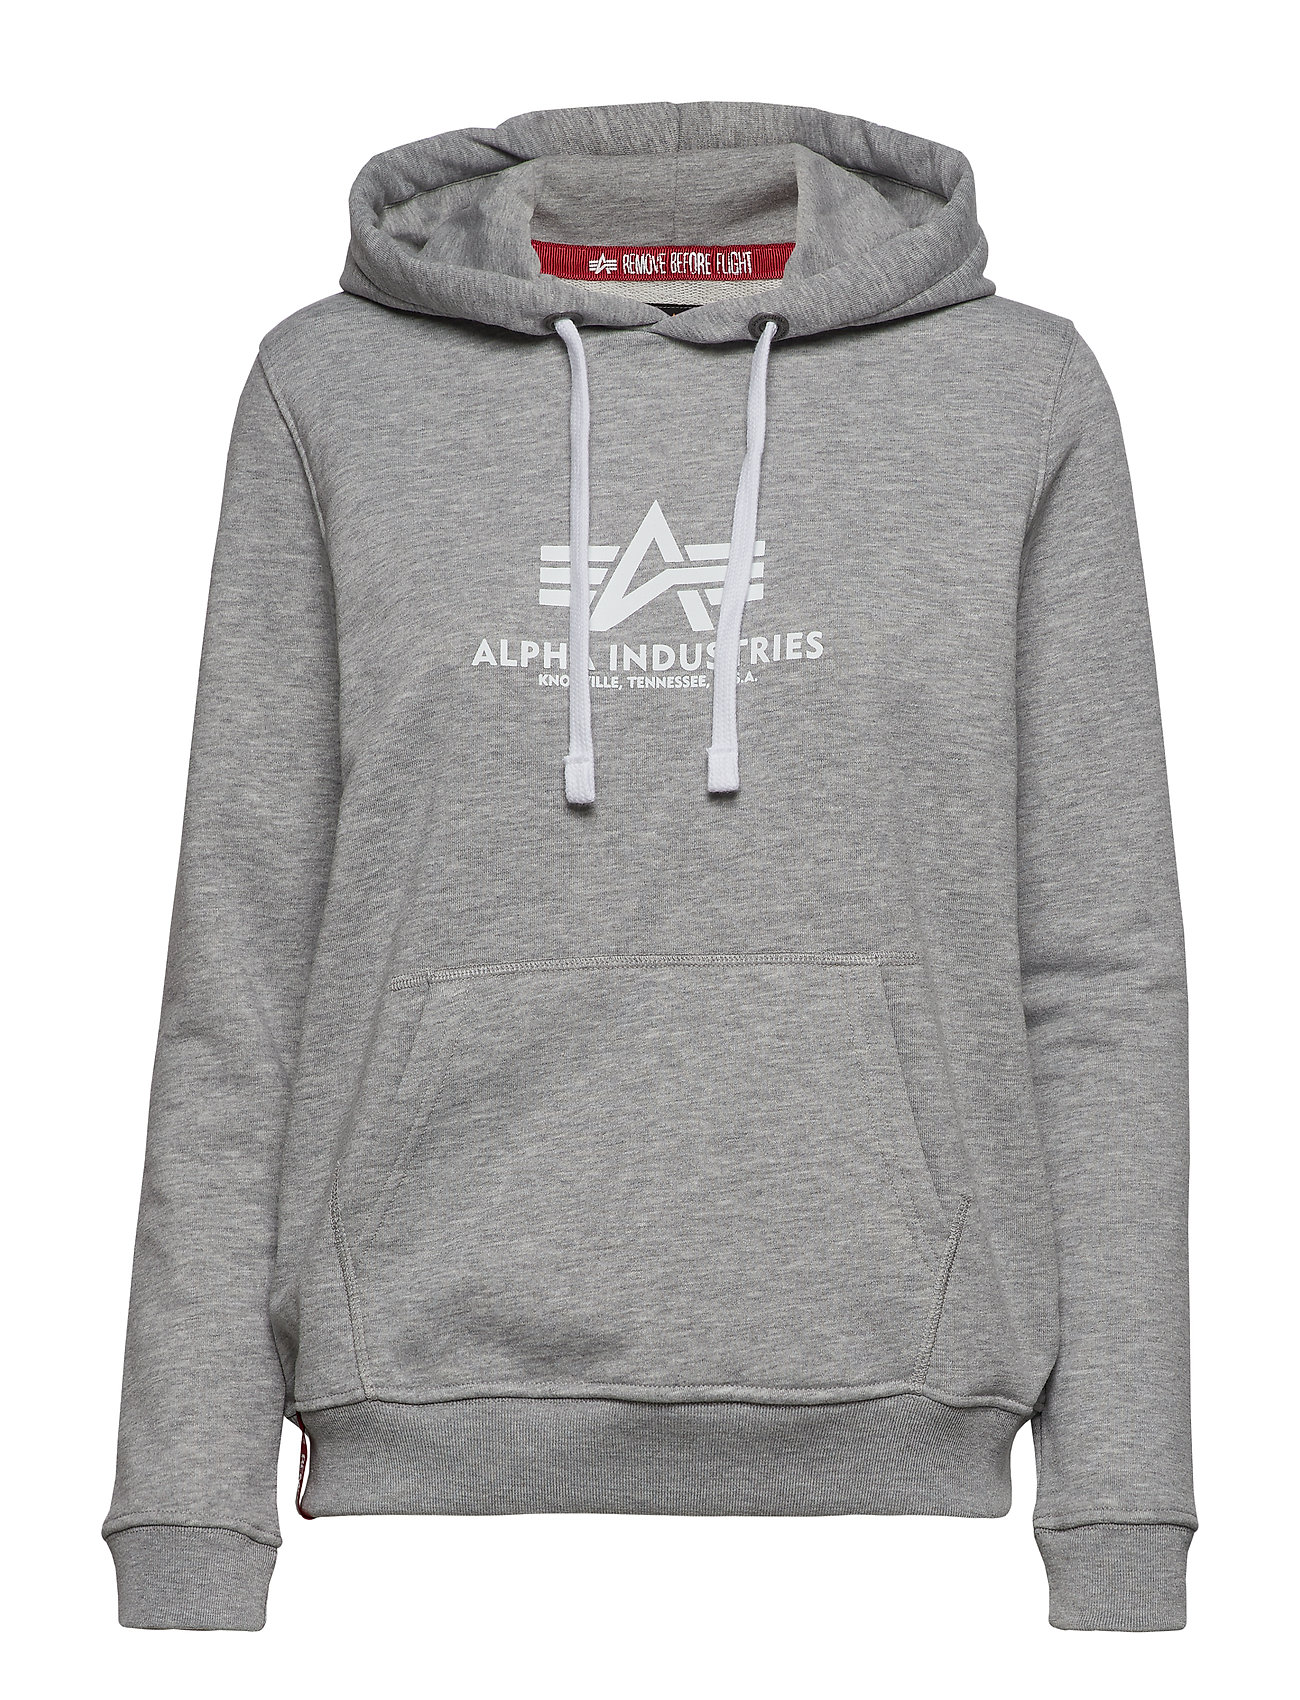 Alpha Industries New Basic Hoody Wmn - GREY HEATHER